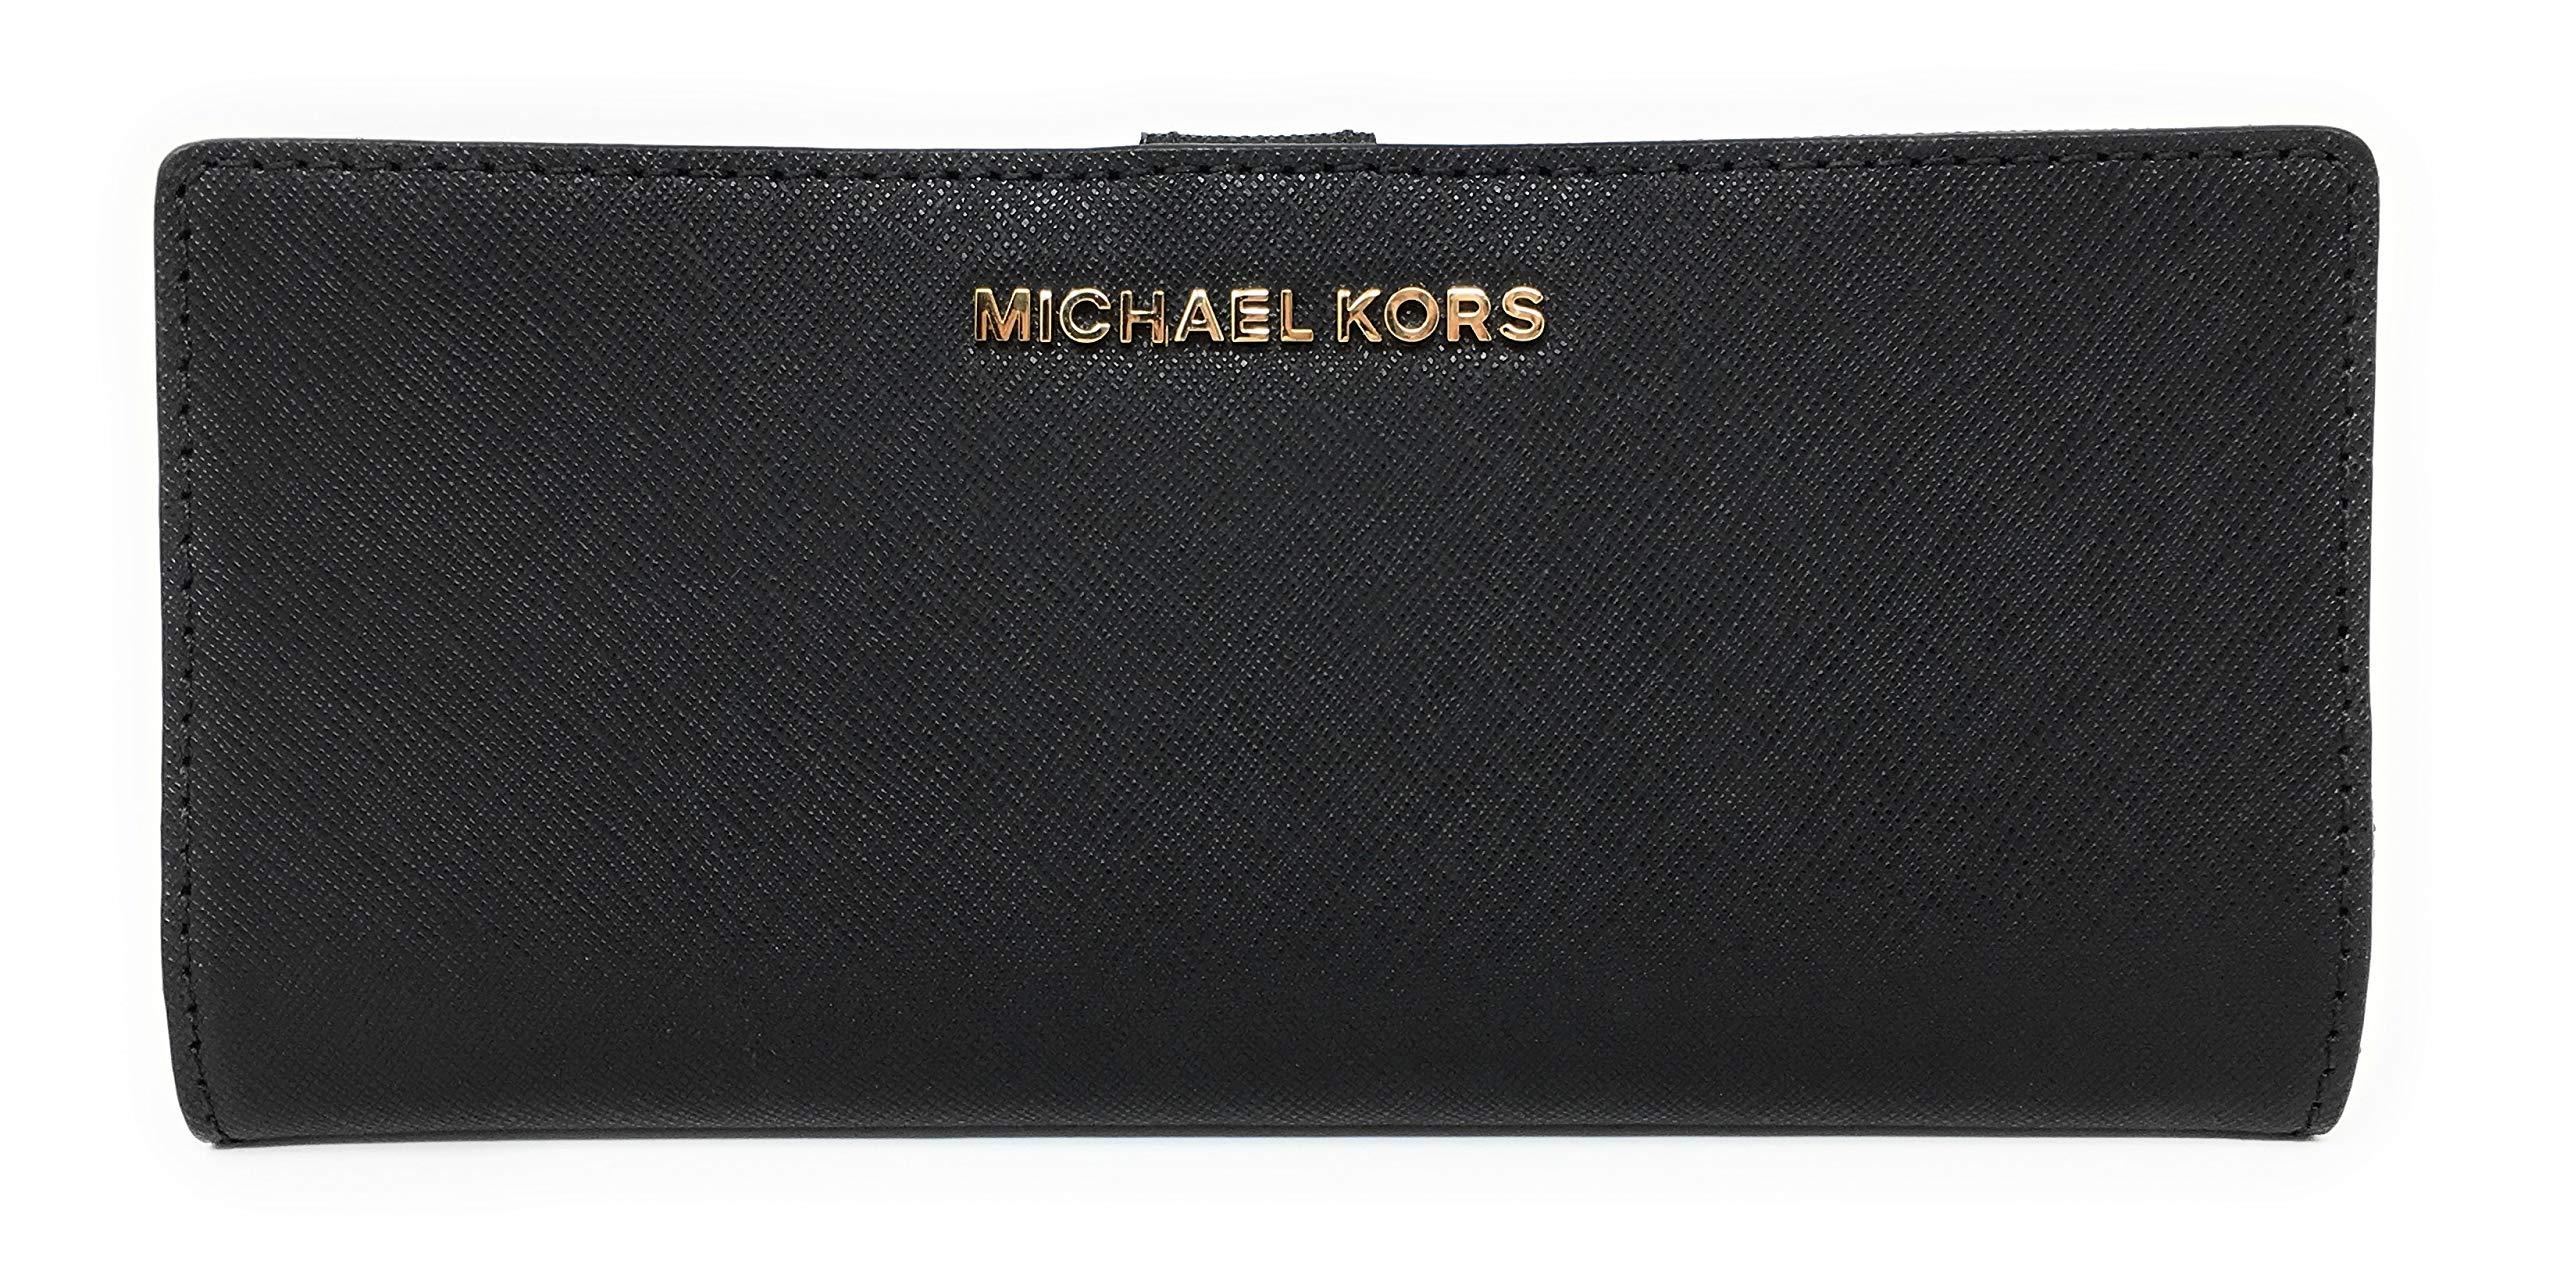 Michael Kors Jet Set Travel Flat Slim Bifold Saffiano Leather Wallet (Black) by Michael Kors